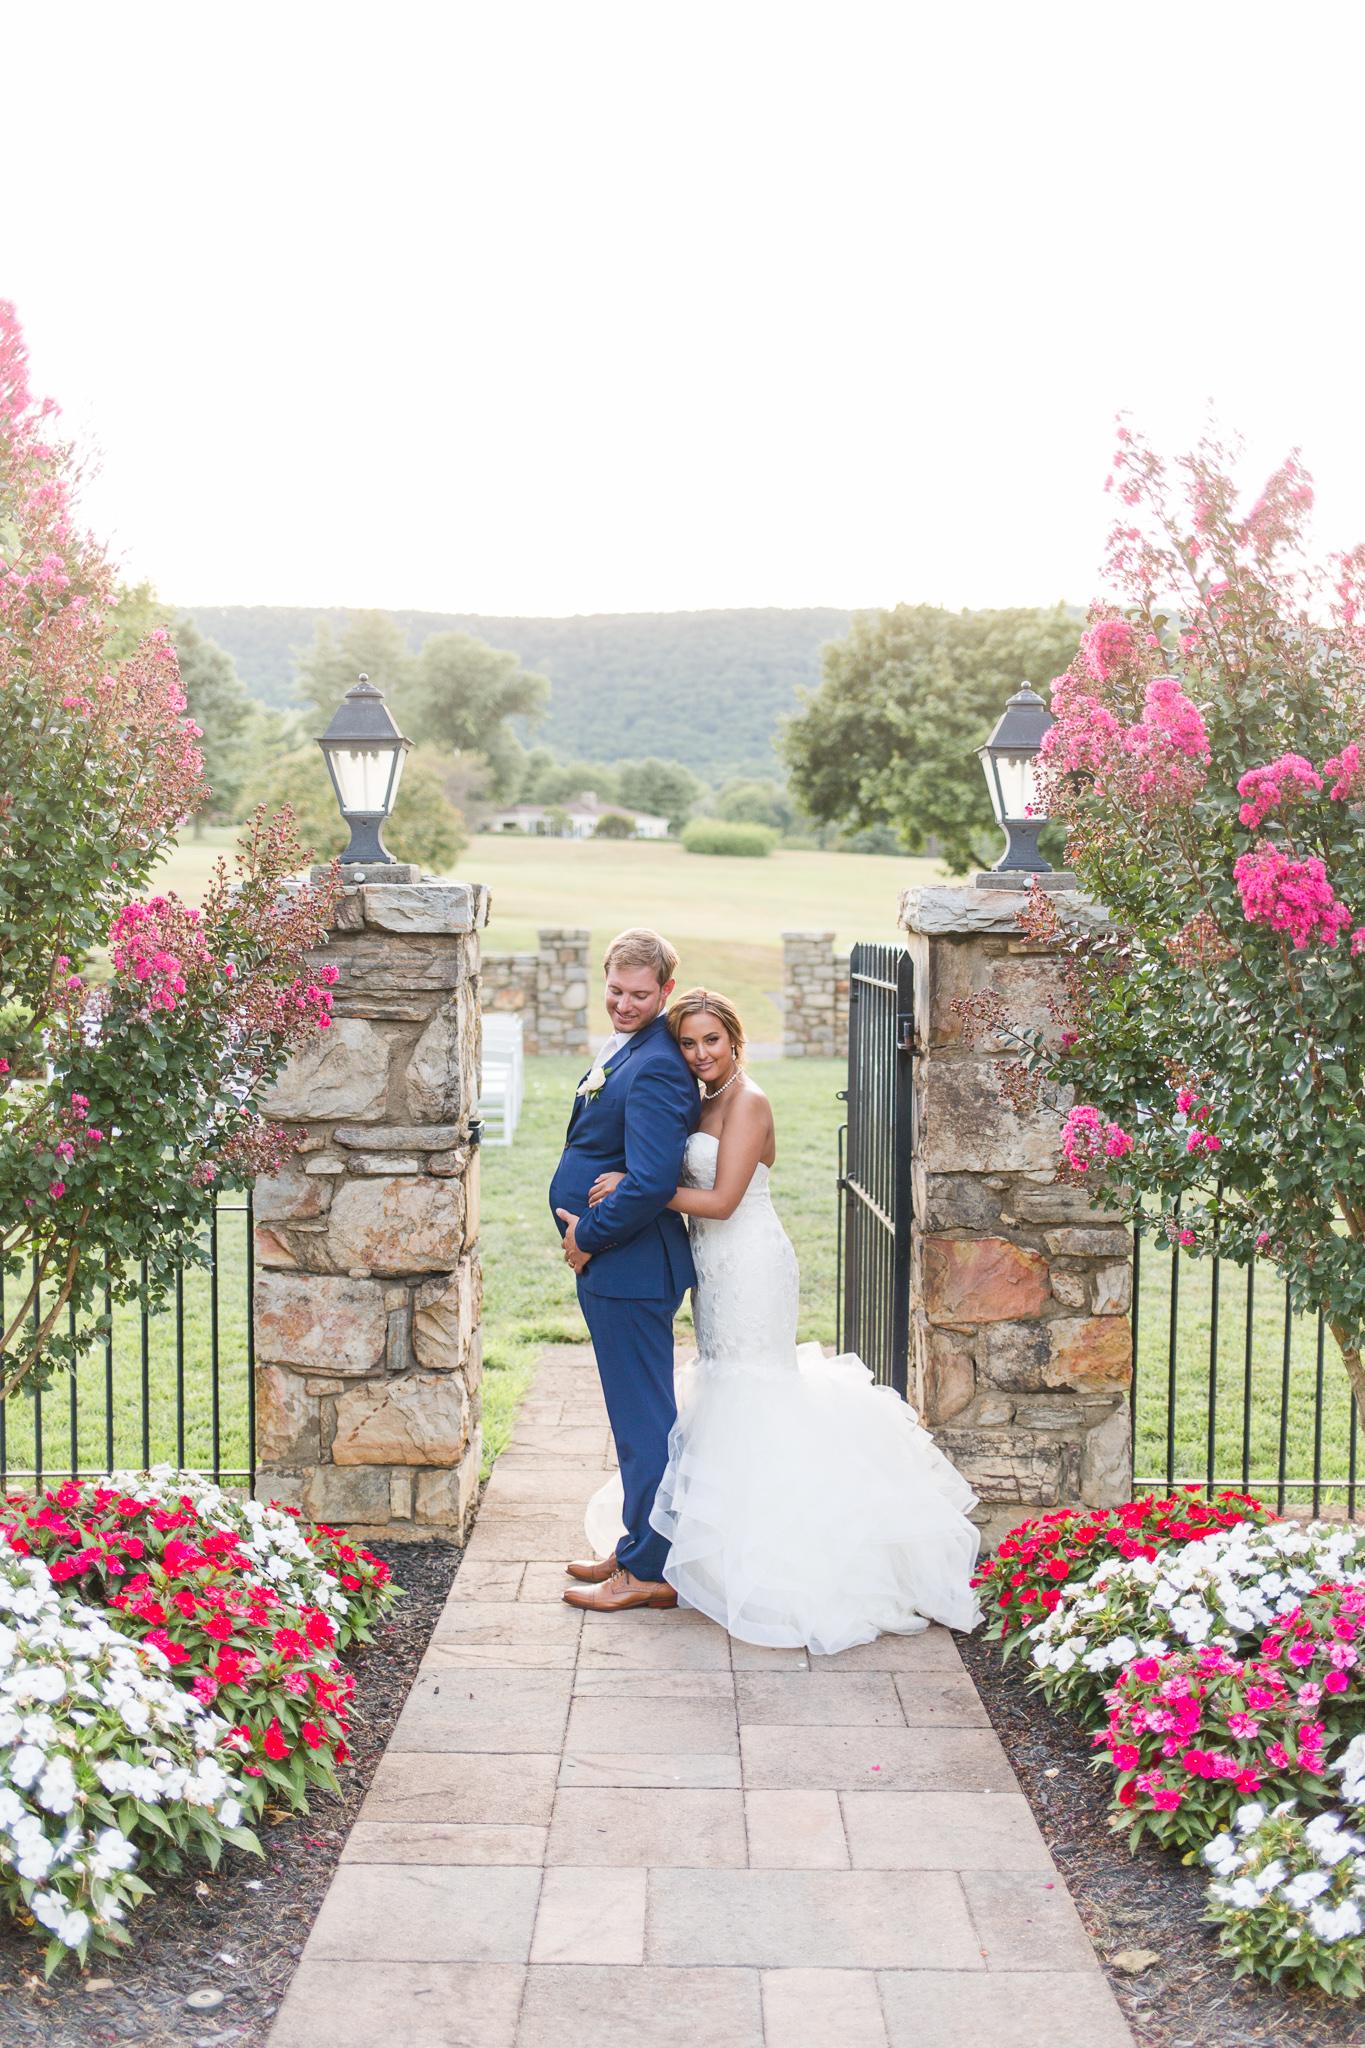 Catie & Elliott   Married-547 copy.jpg